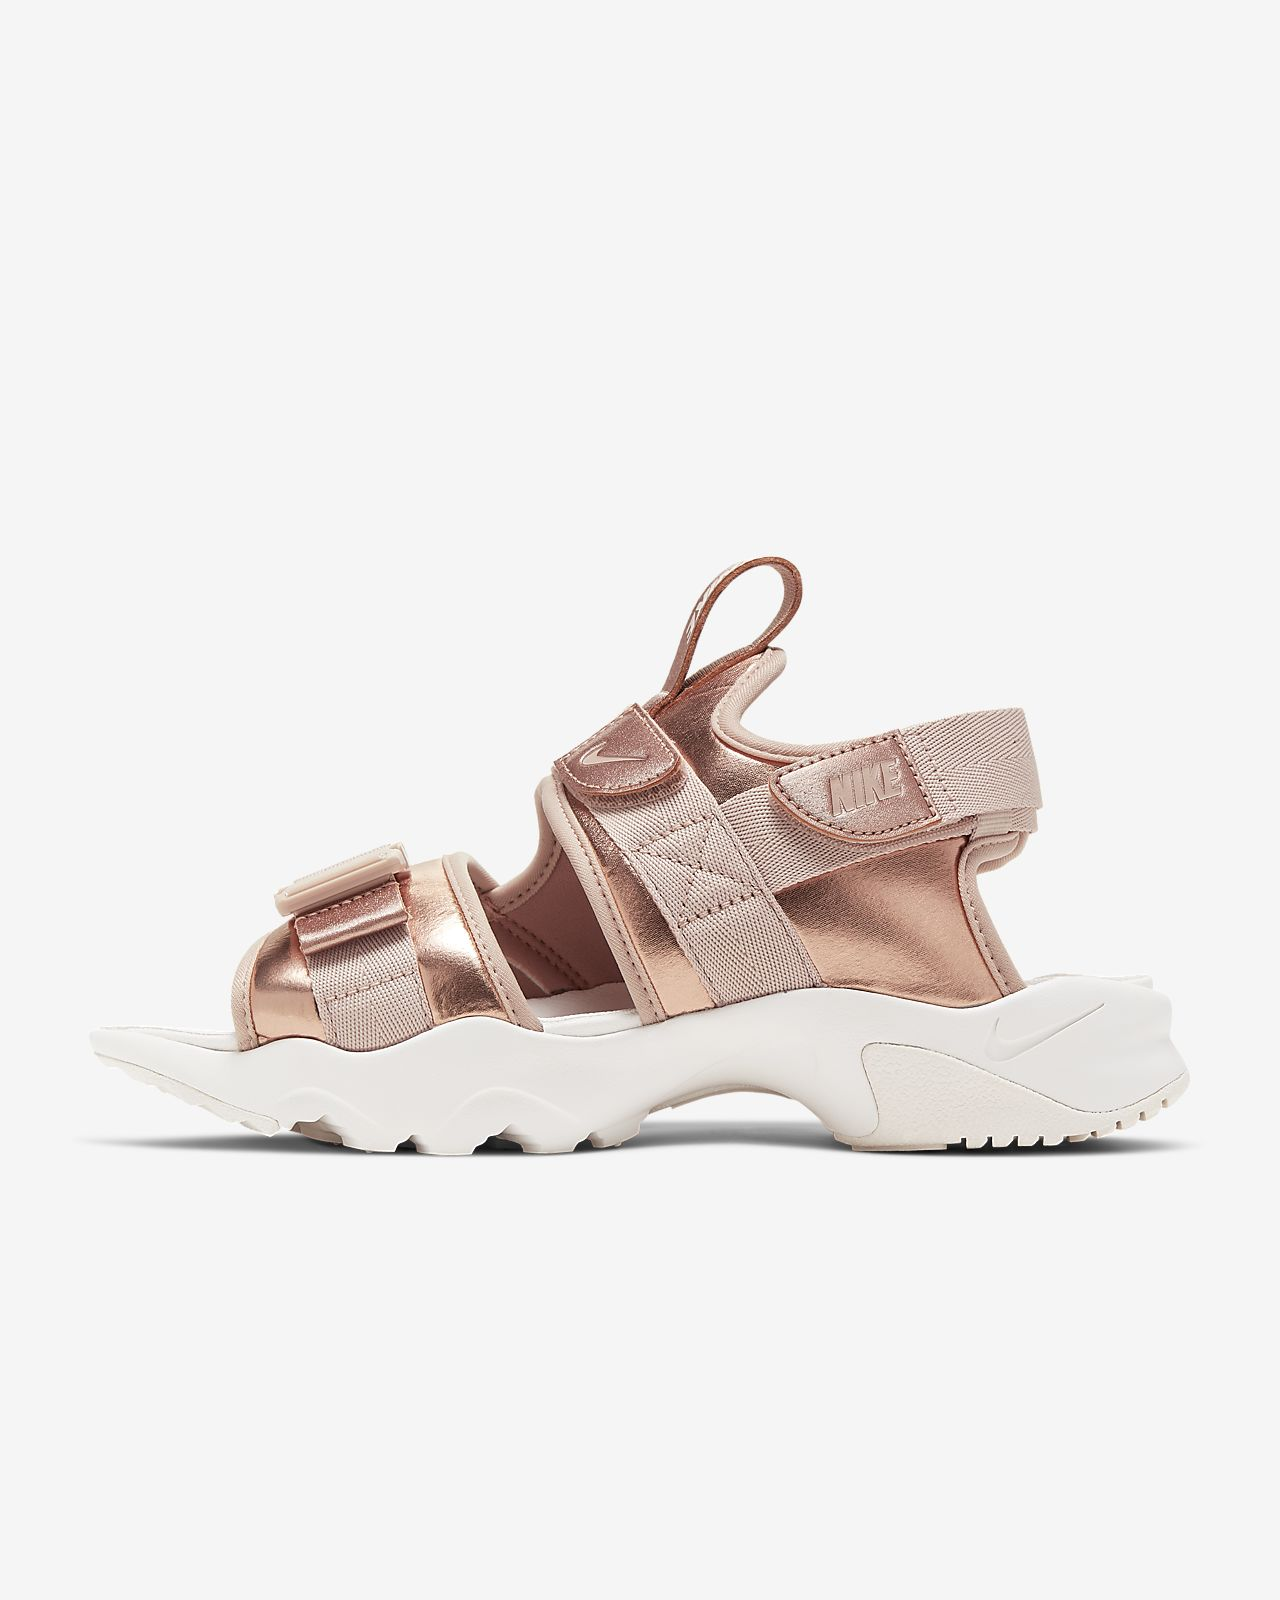 Nike Canyon Sandal 女子凉鞋